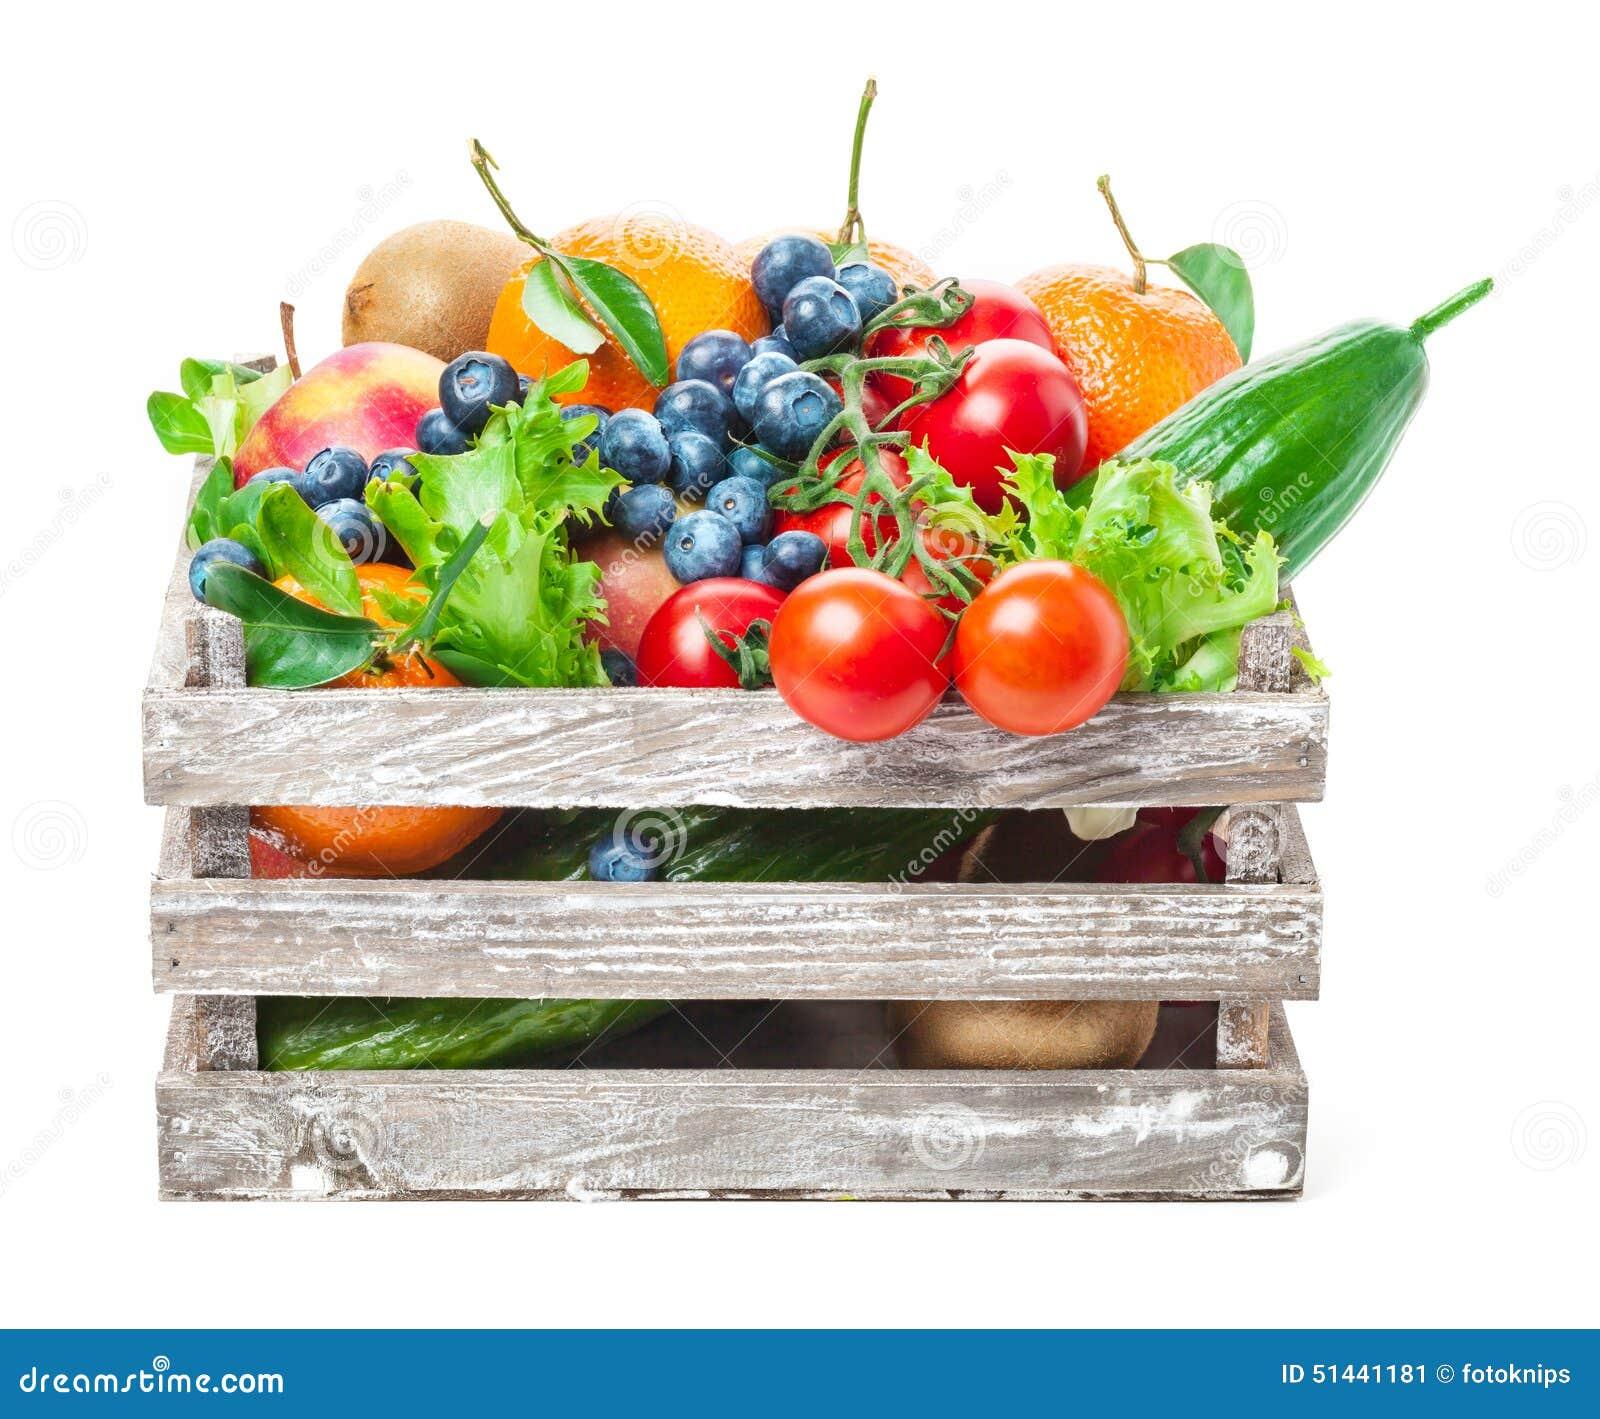 Cajas de madera de fruta gratis amazing affordable - Cajas de madera de fruta gratis ...